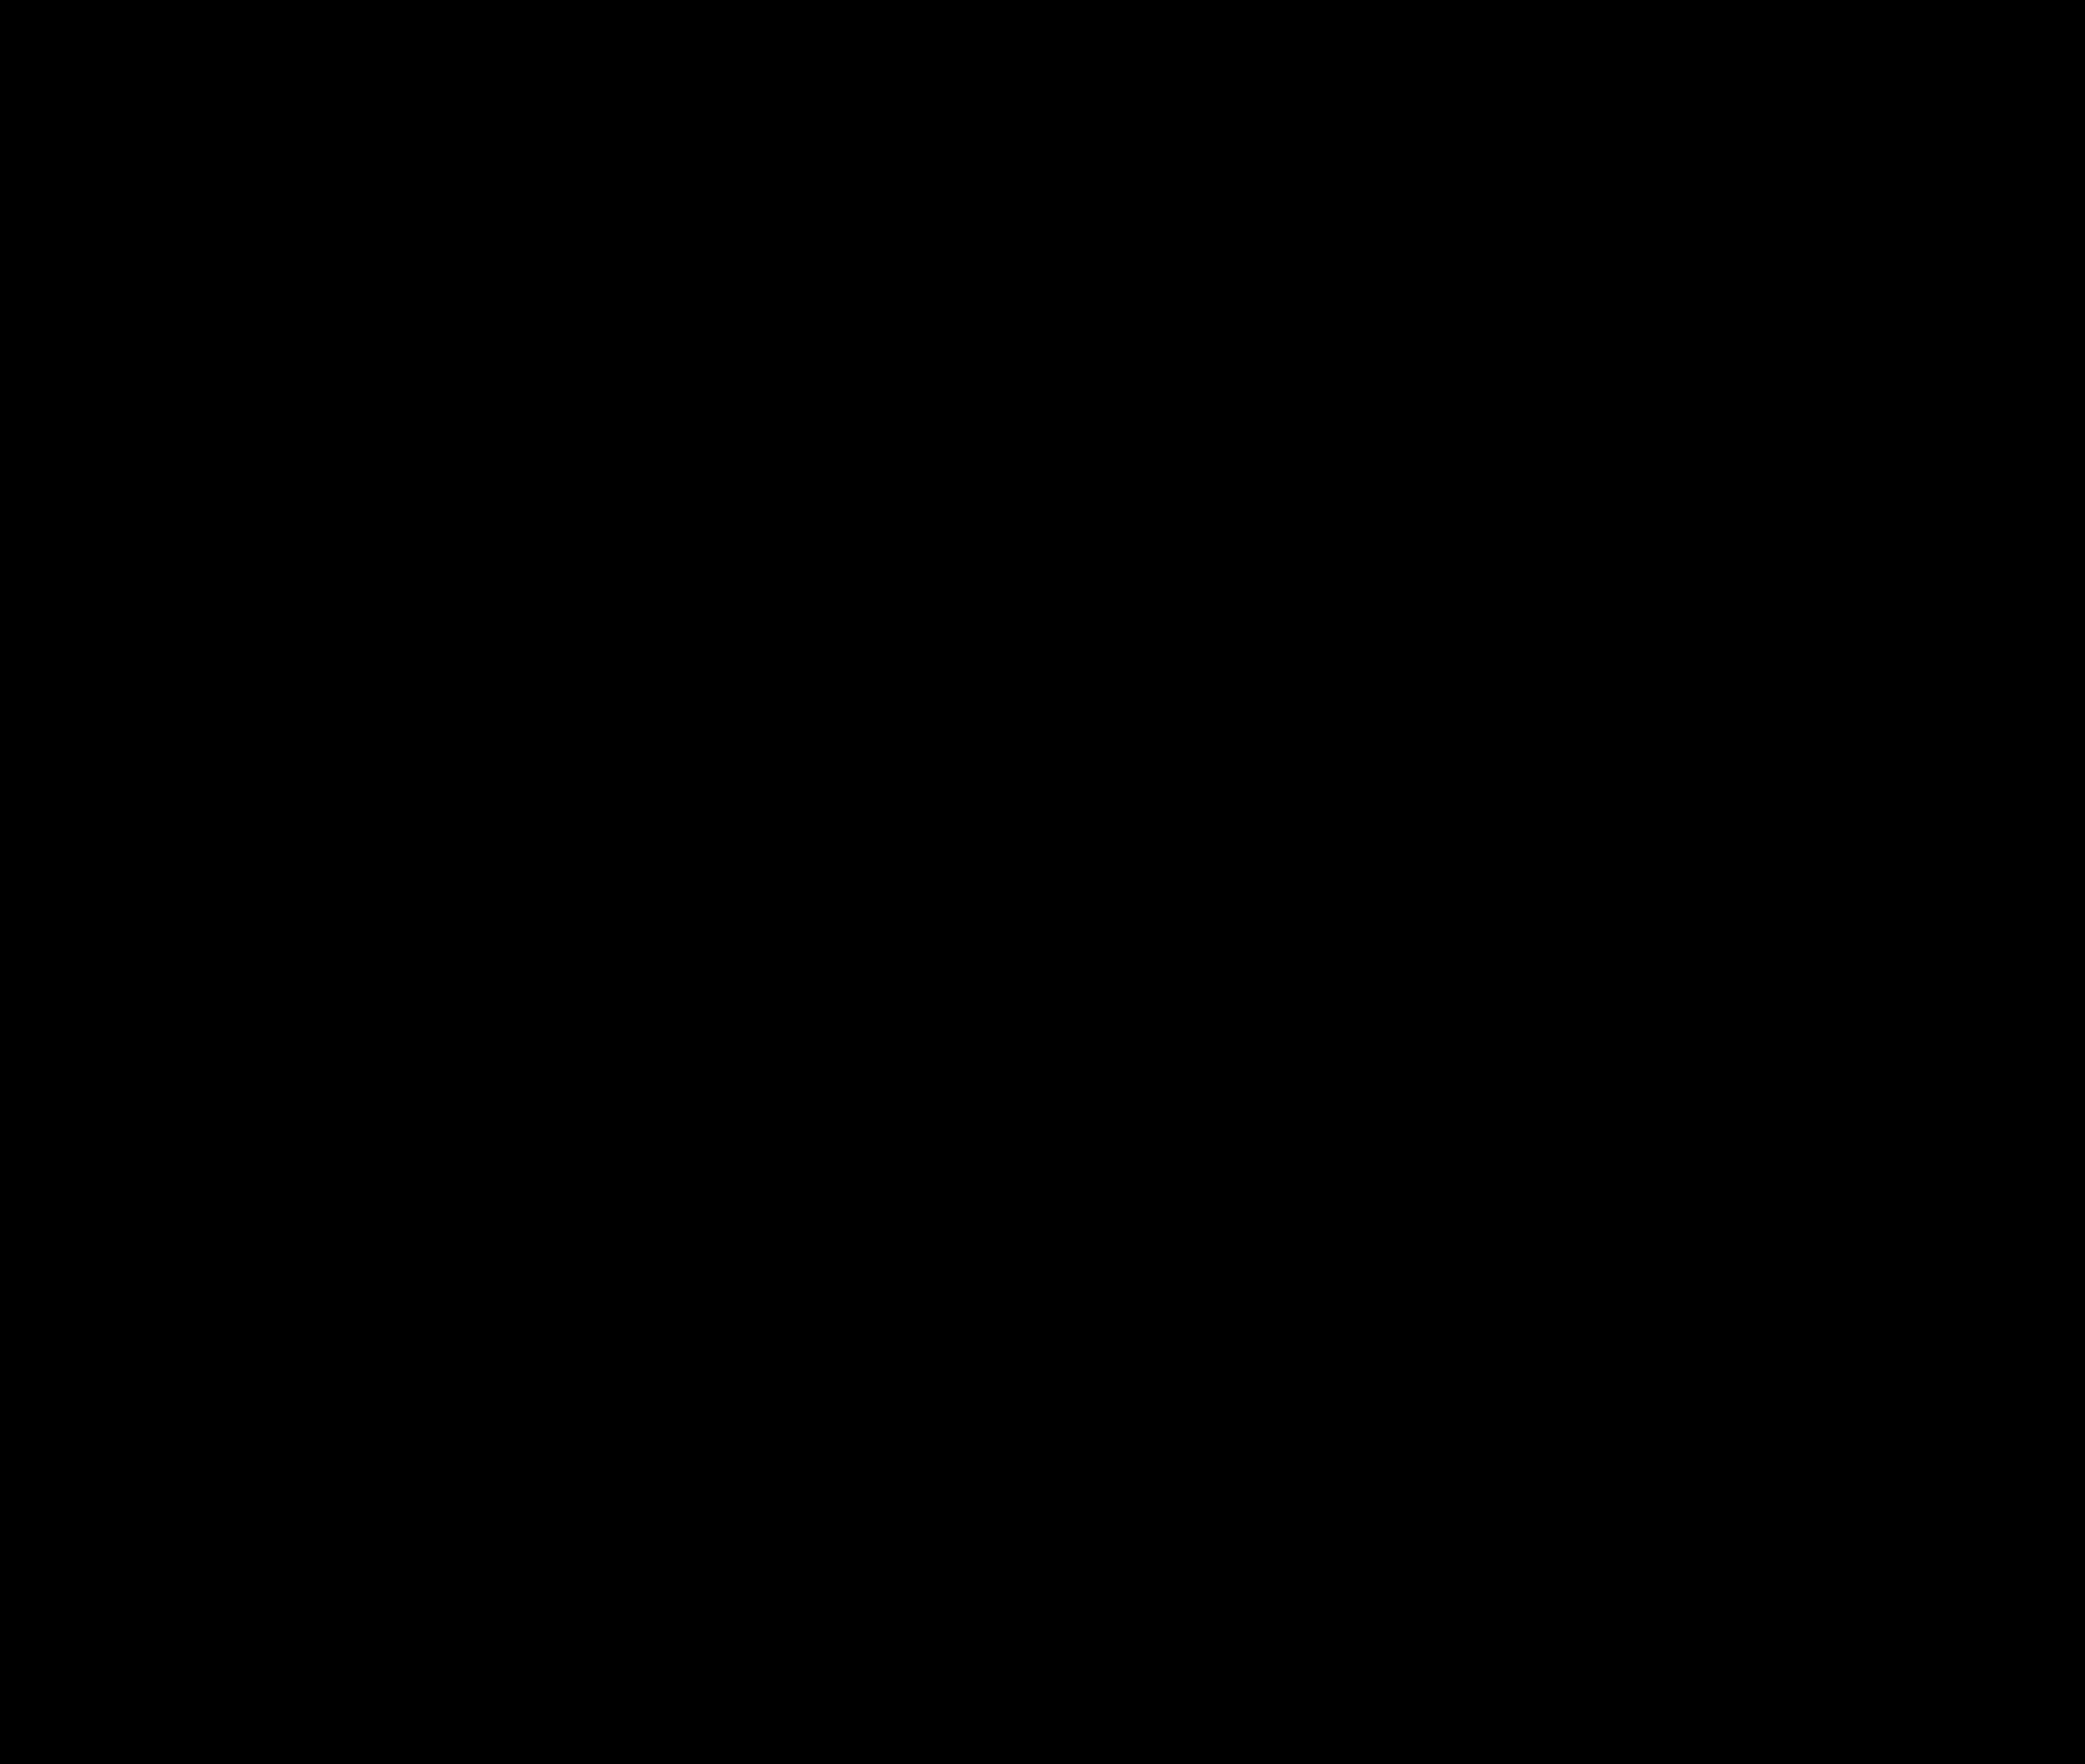 R clipart alphabet r. Cyrillic letter big image